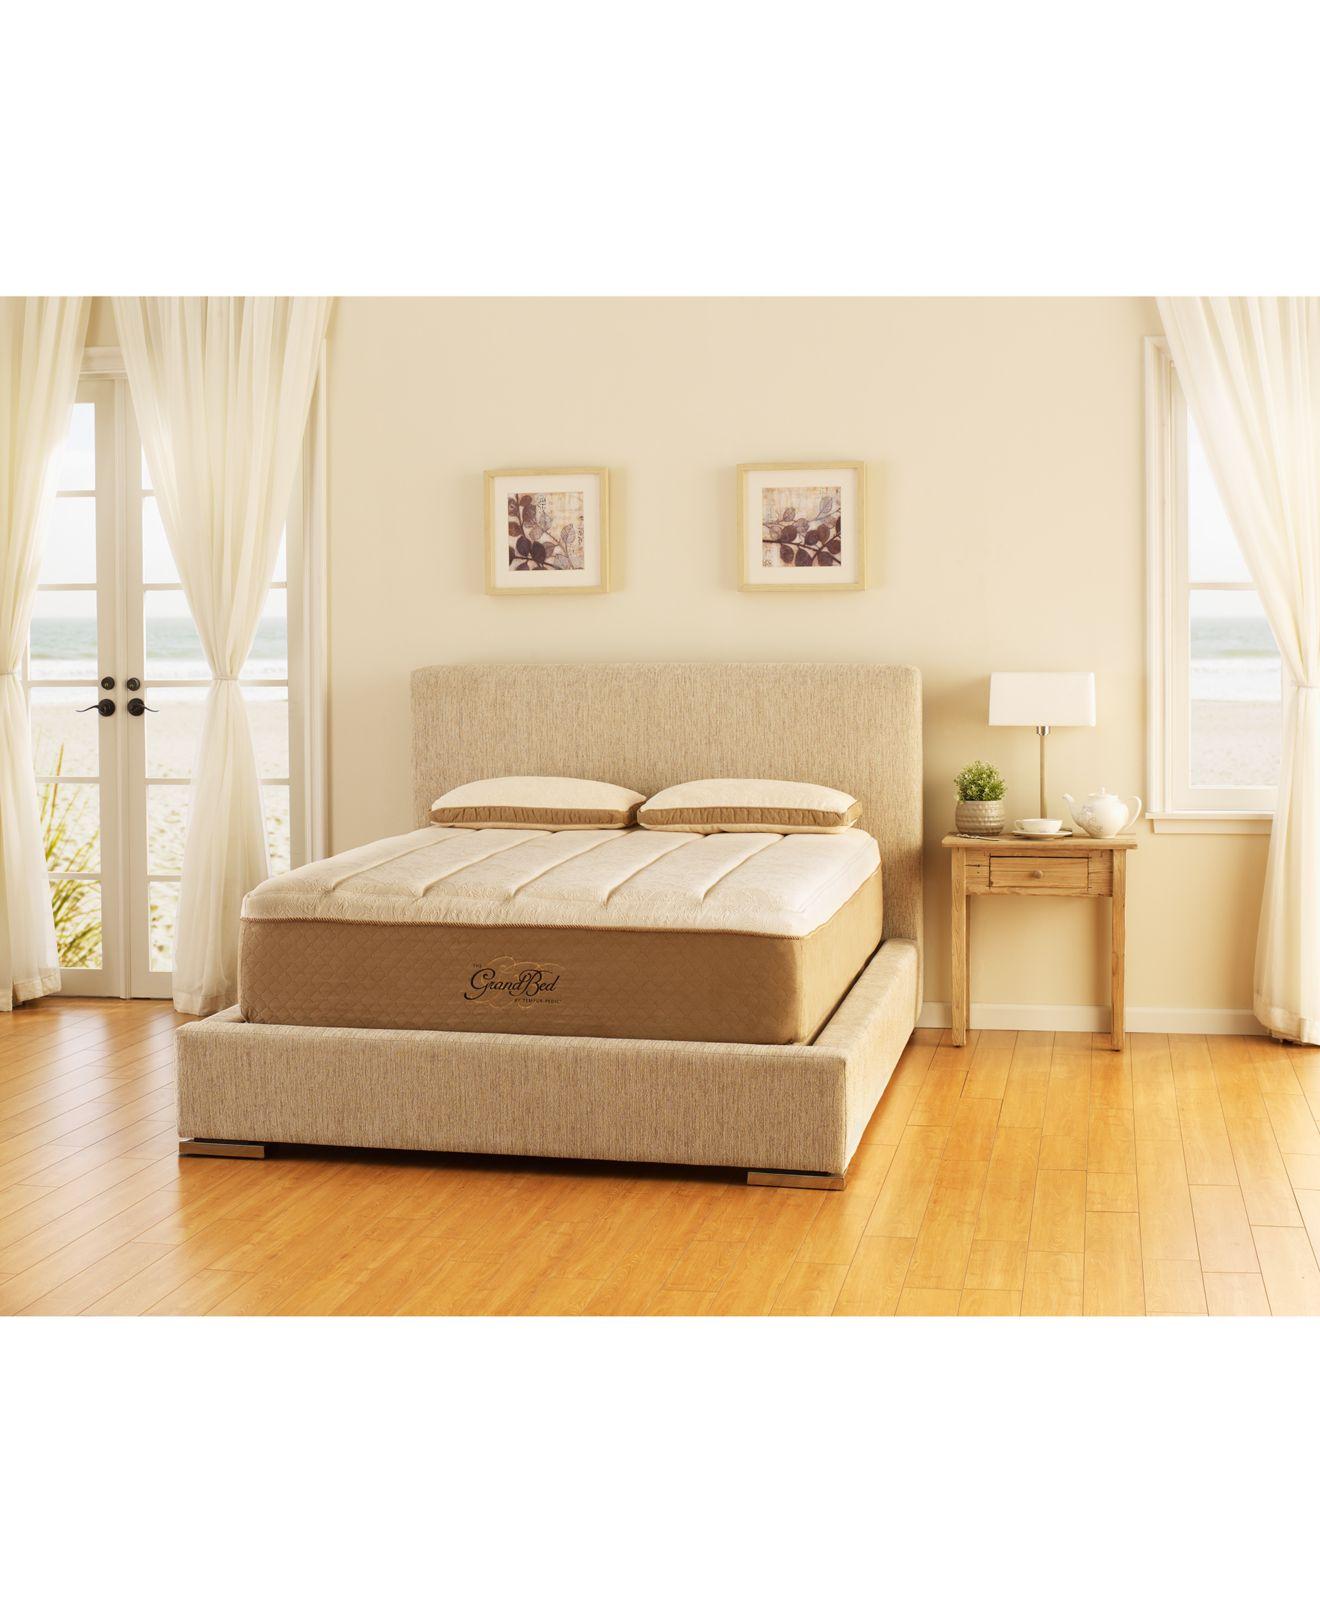 tempur-pedic mattresses - macy's